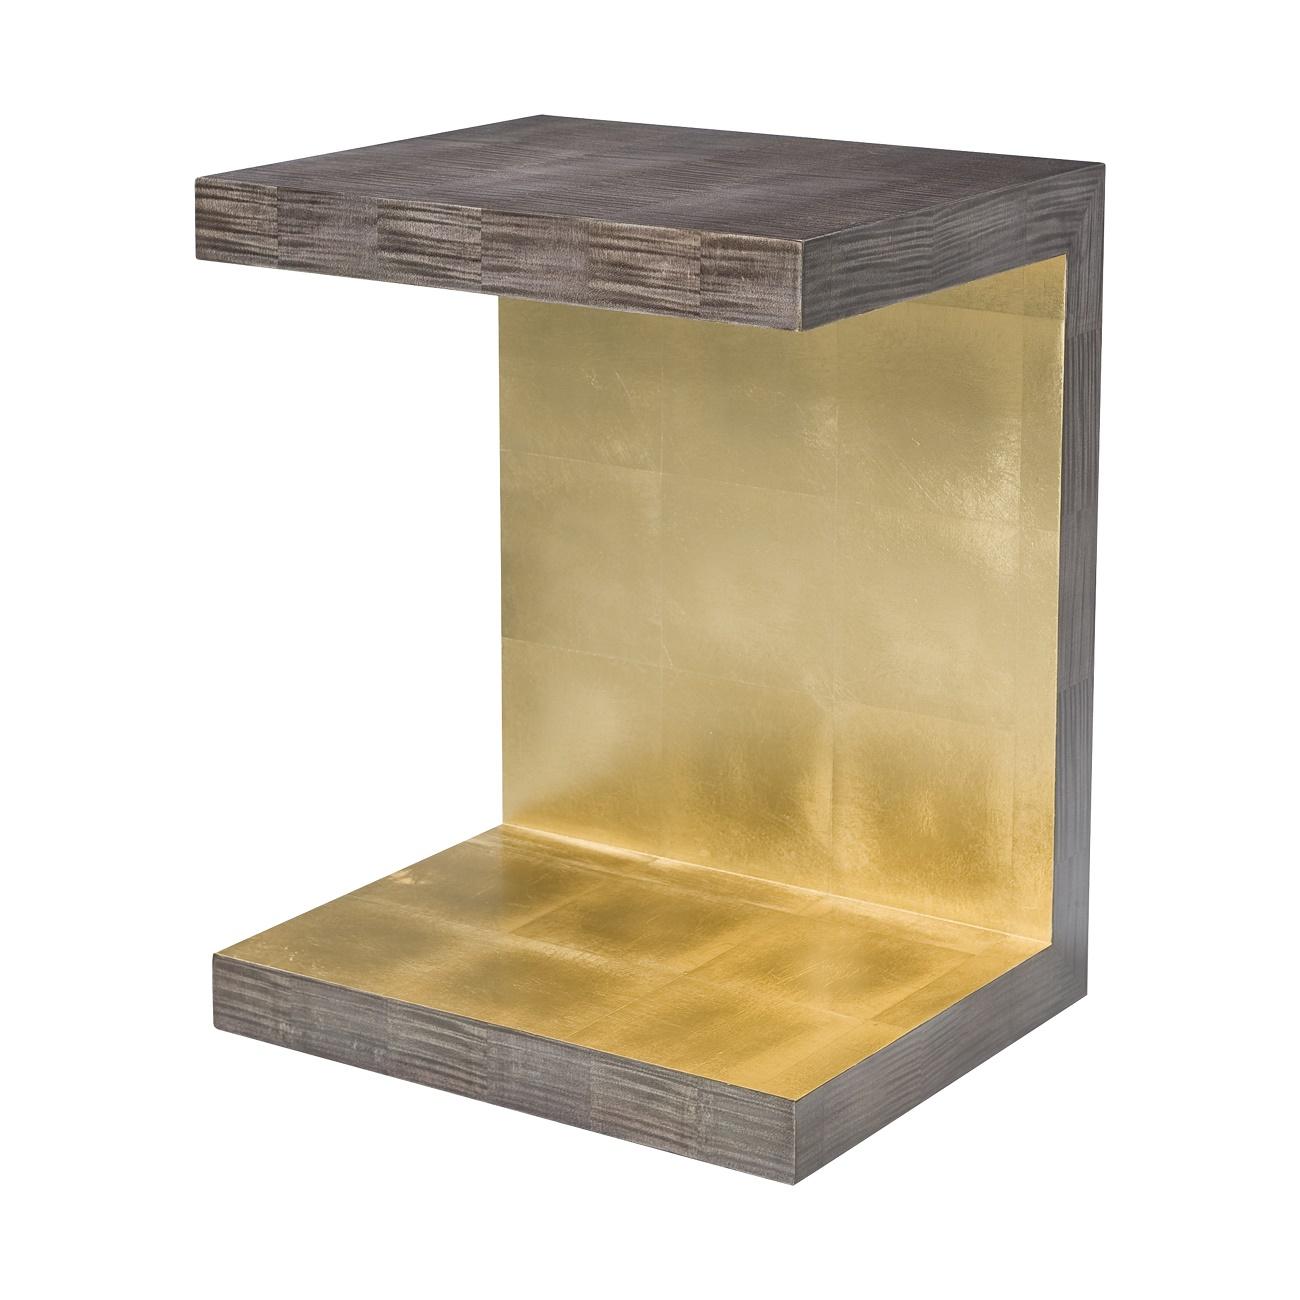 5005 856 Metallic Signature Piece Accent Table theodore alexander